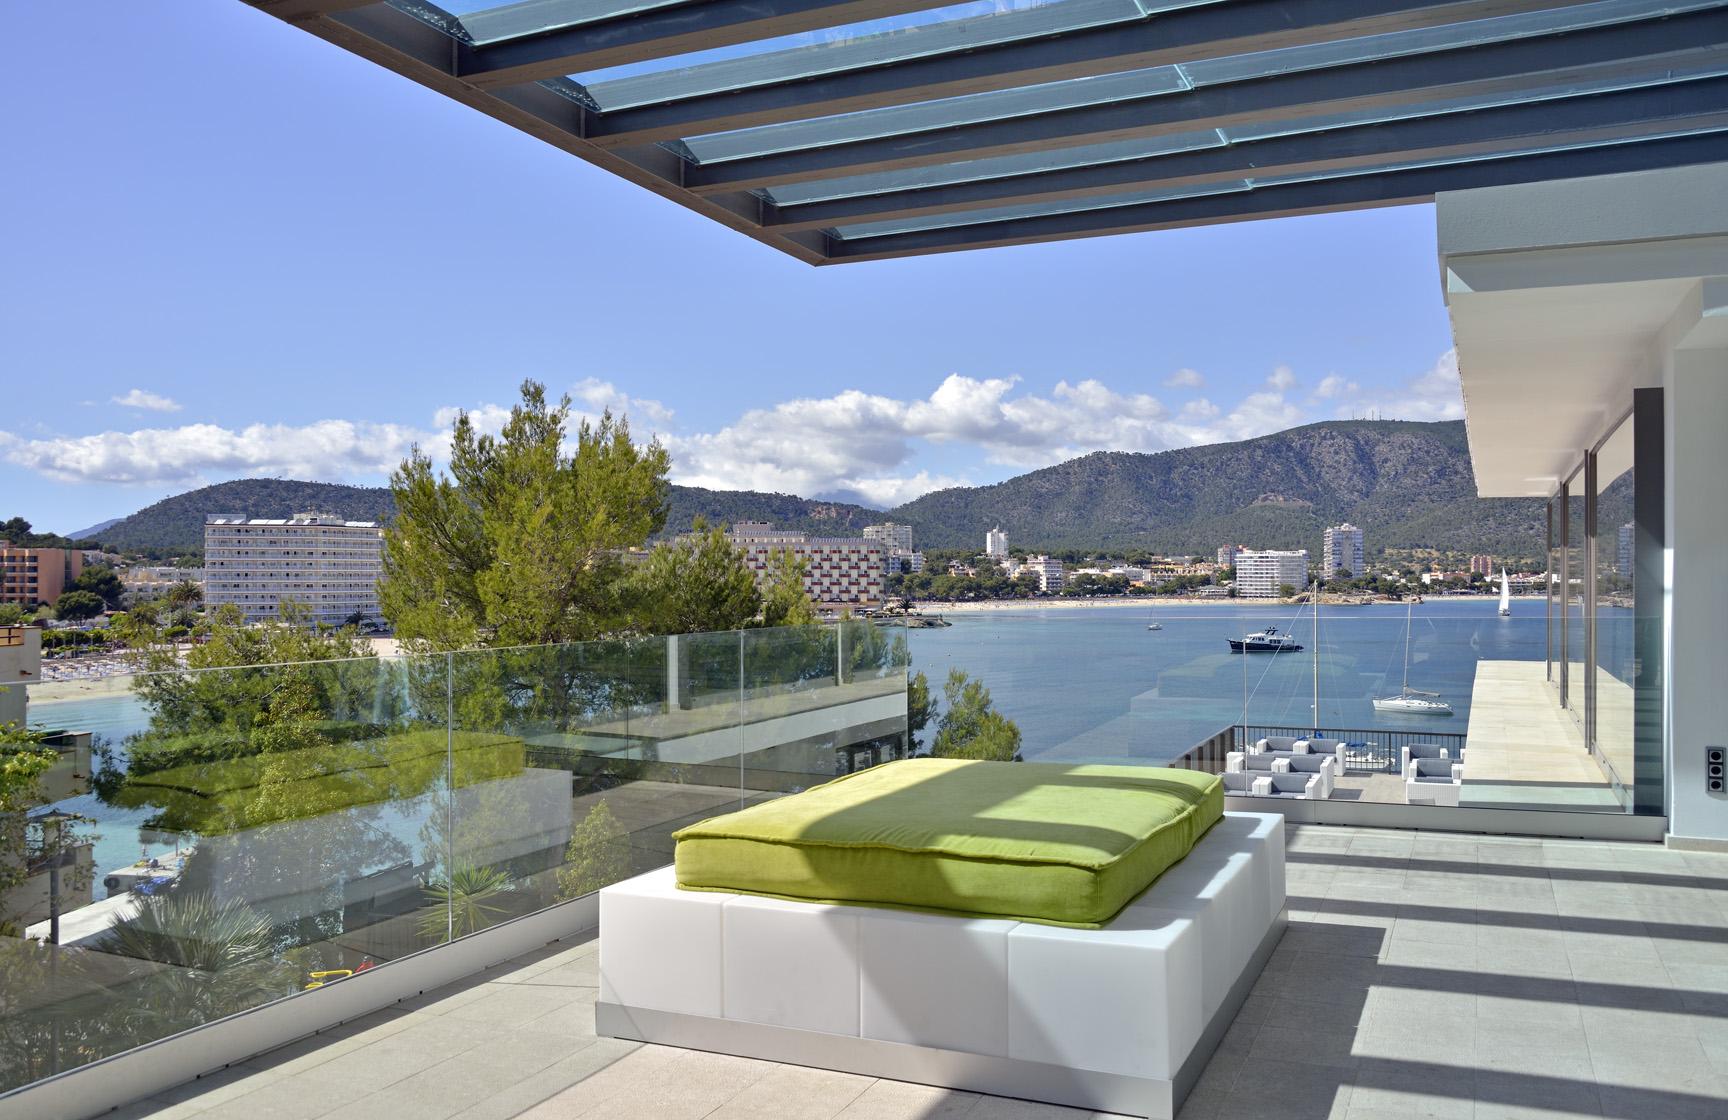 Kkr led venture acquires spain 39 s intertur hotels group for Top design hotels mallorca